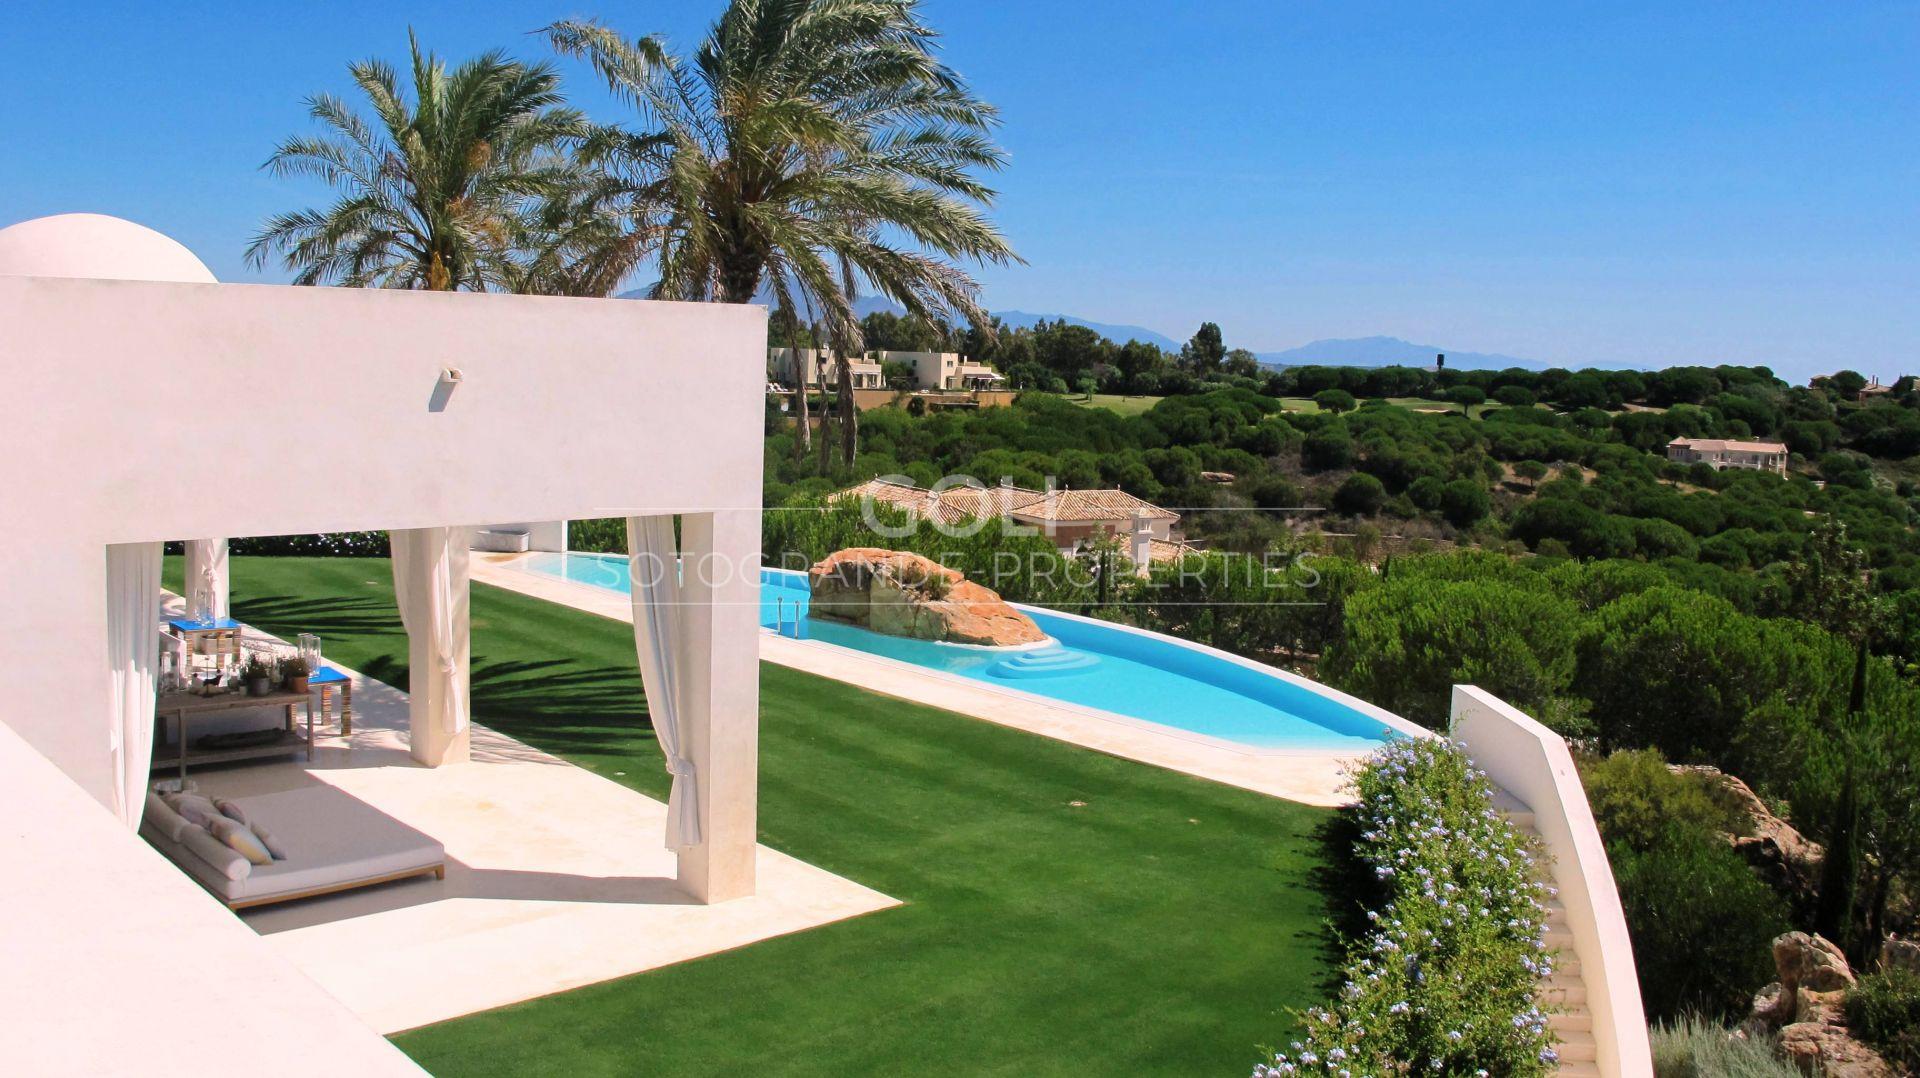 Fantastic villa with amazing views